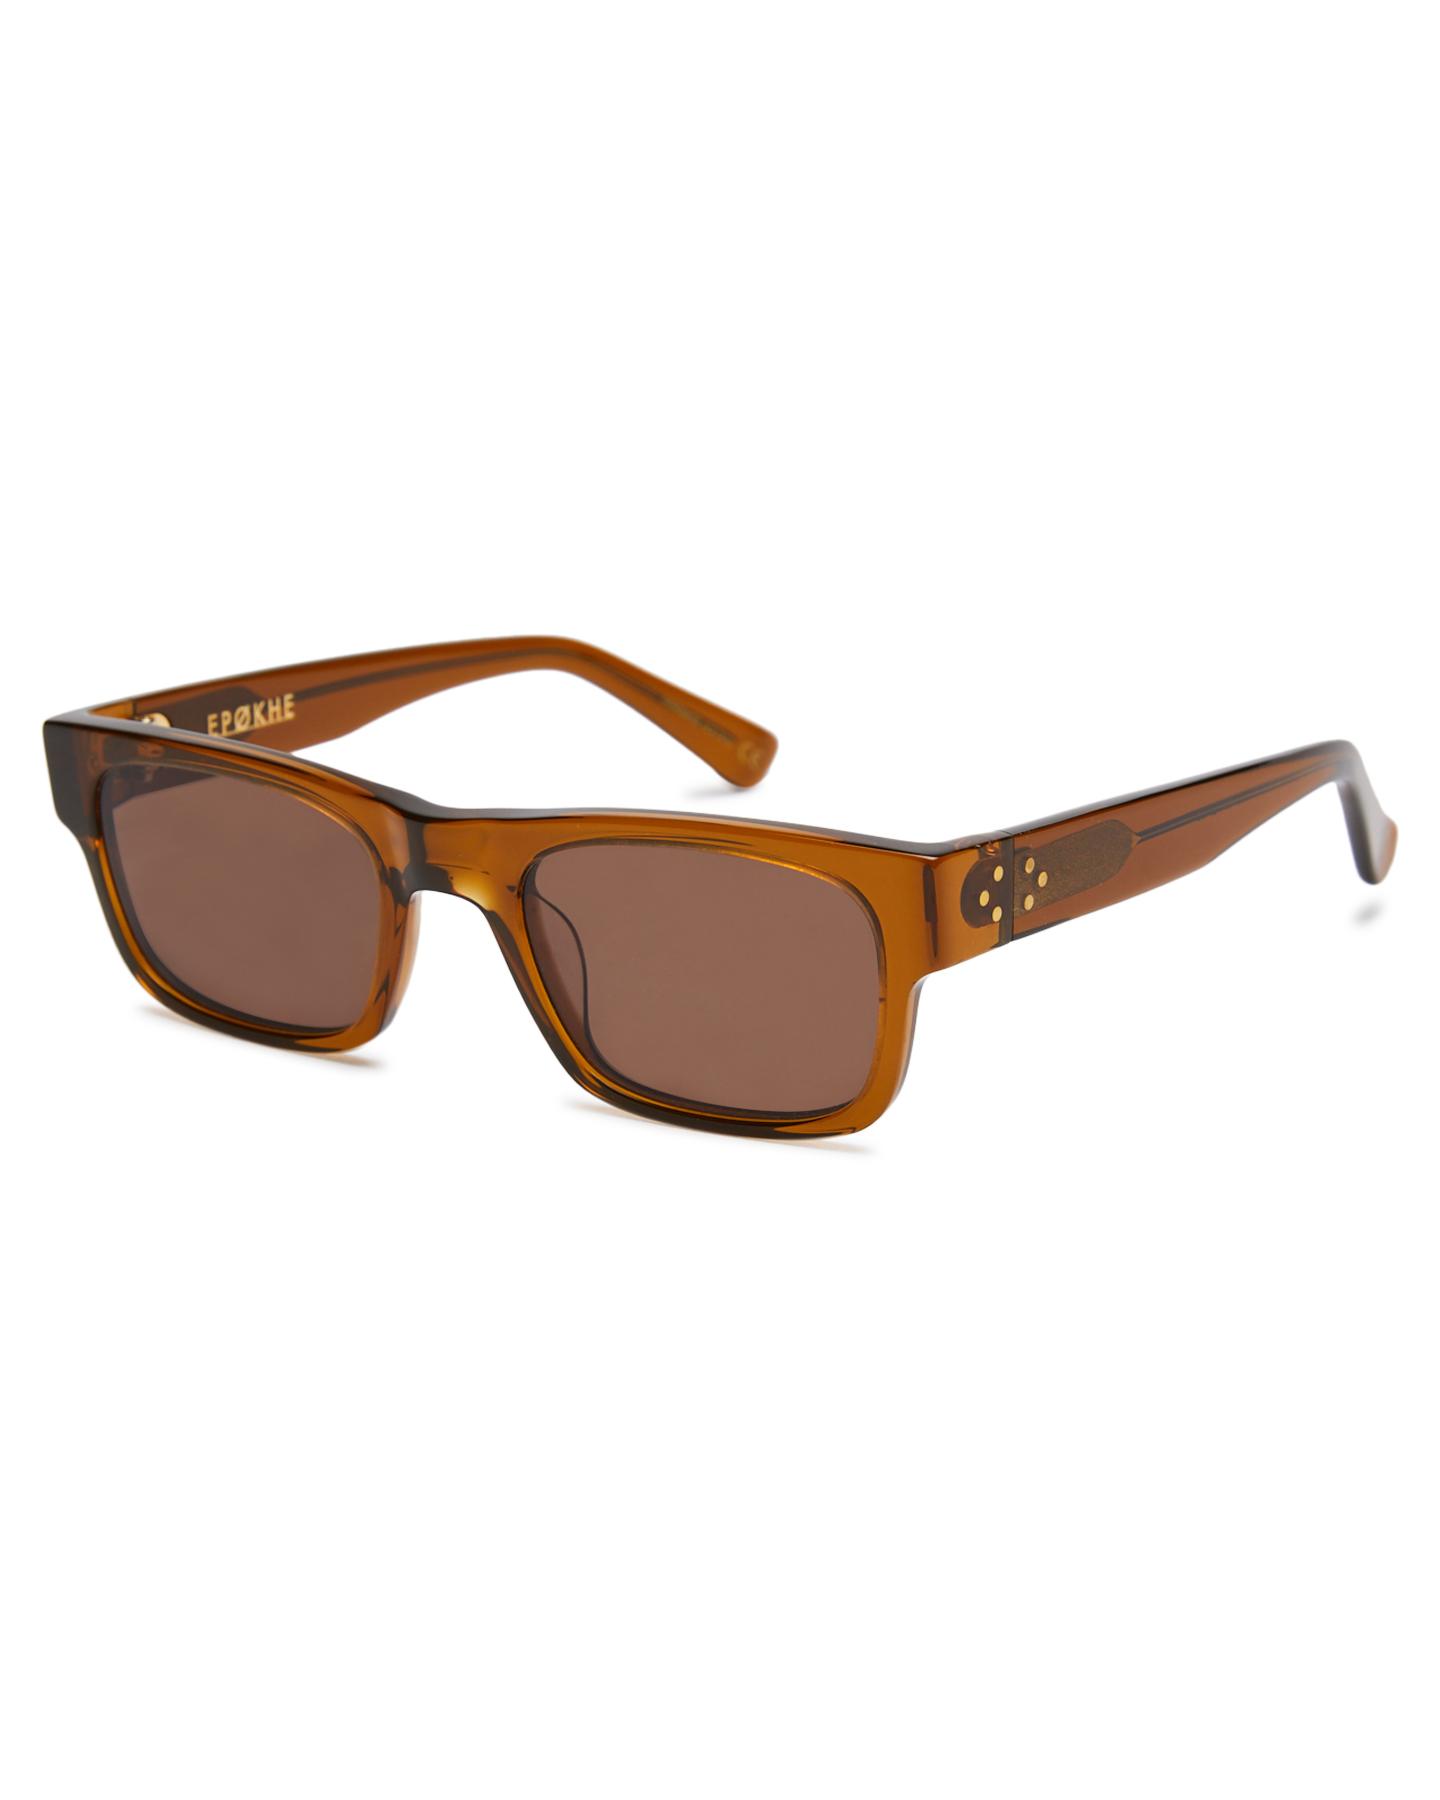 Epokhe Uzi Sunglasses Tobacco Polish Brnz Tobacco Polish Brnz